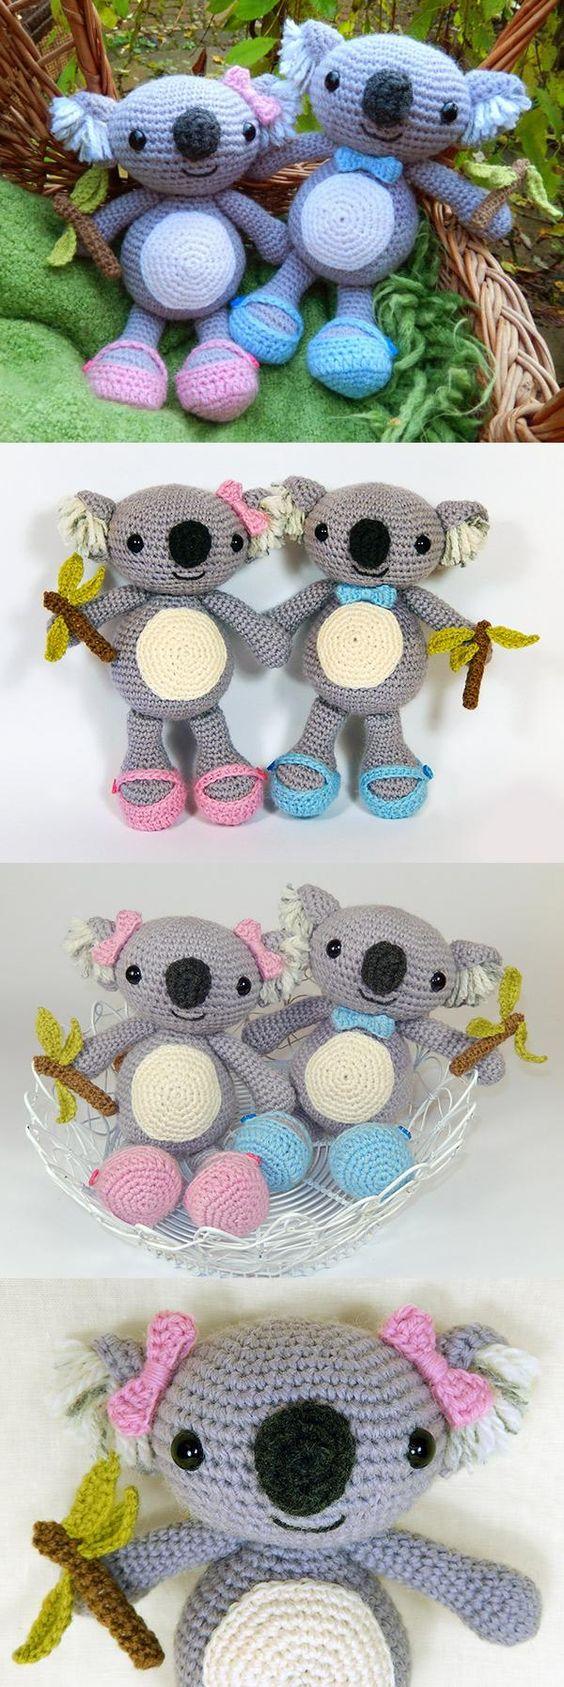 Crochet Koalas... I'm in love! Found at Amigurumipatterns.net